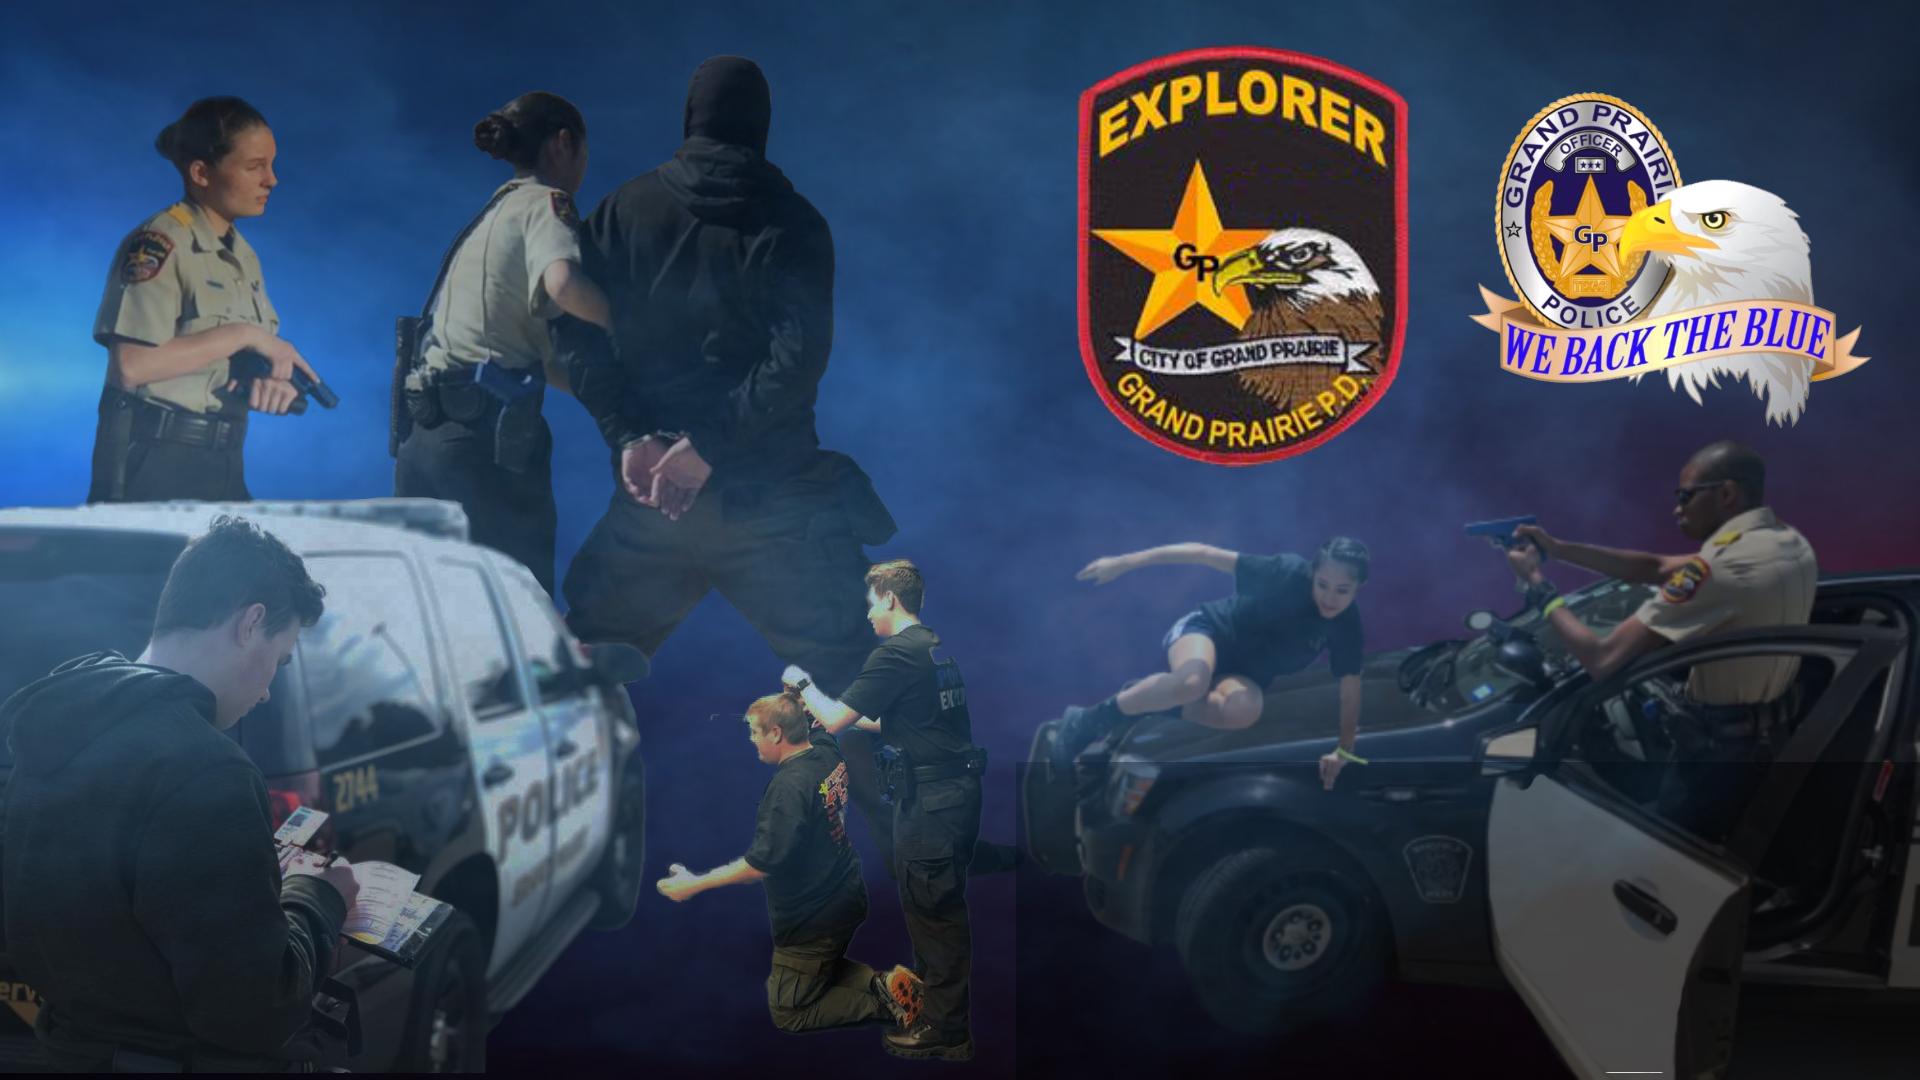 GPPD Explorer Collage